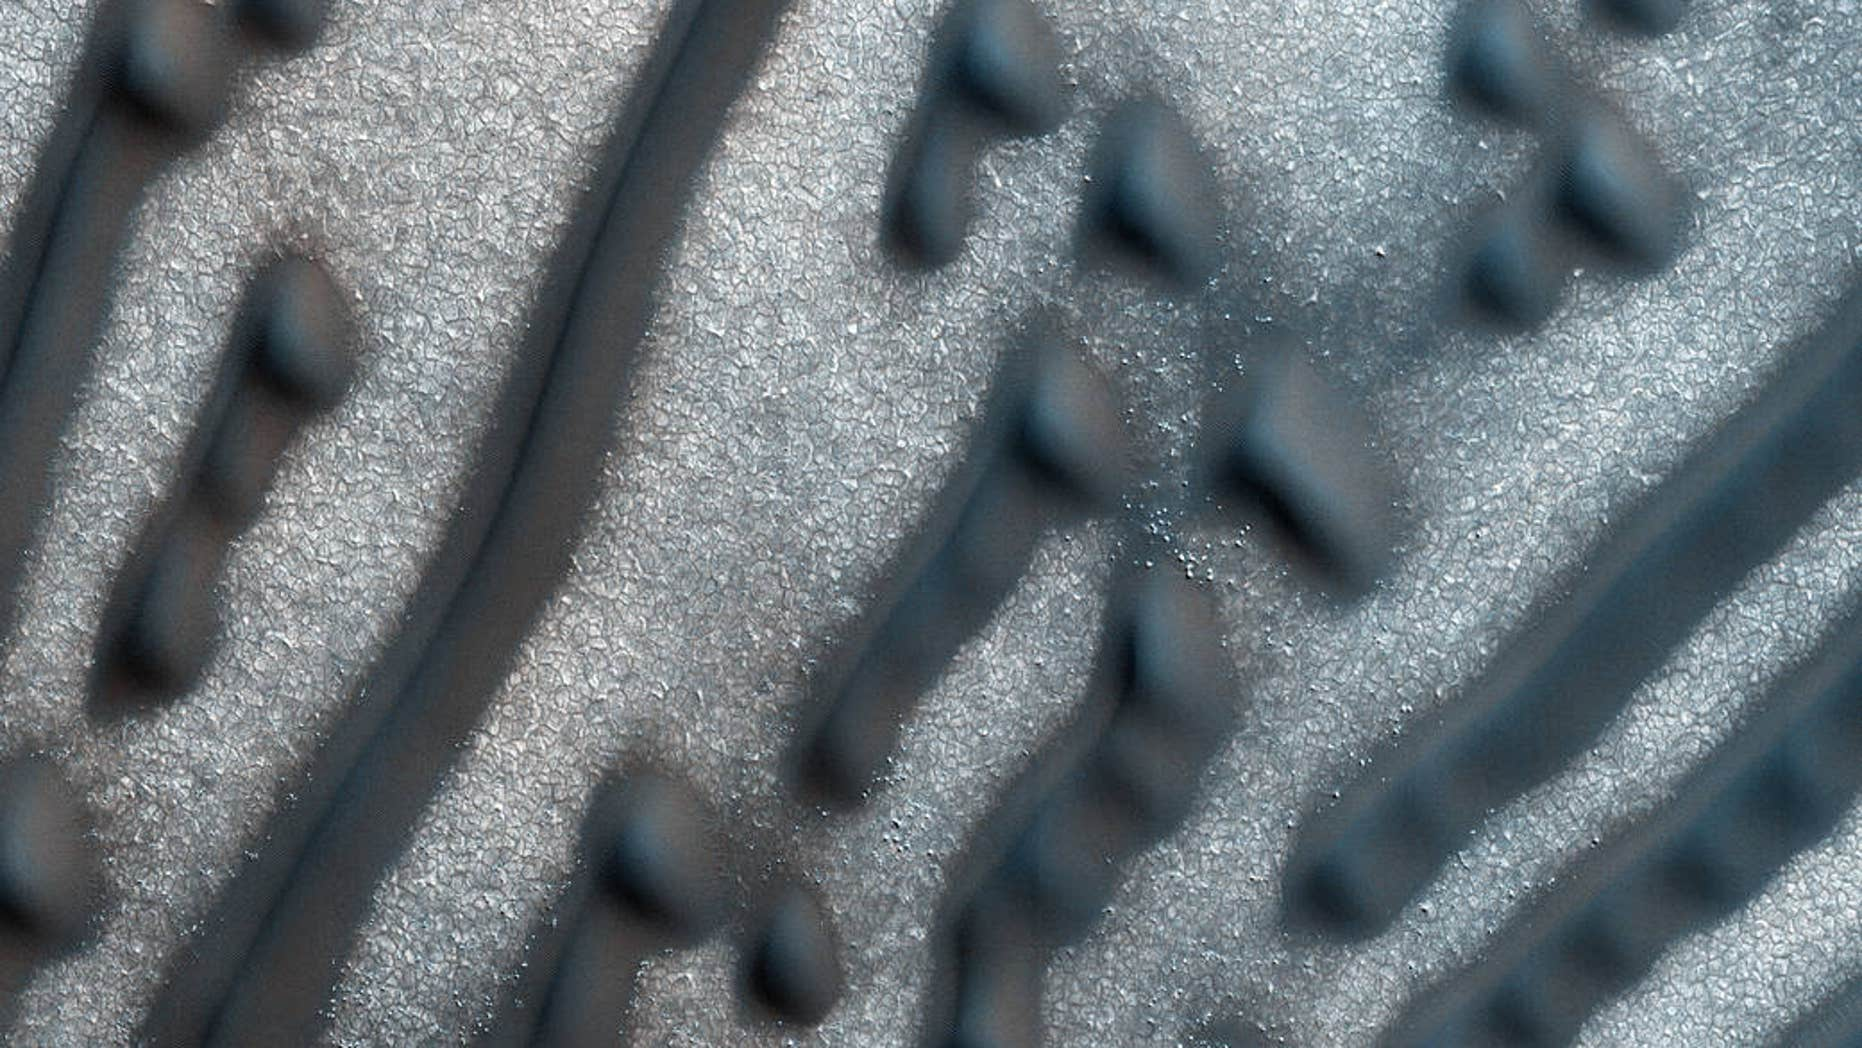 The Martian dunes (Image Credit: NASA/JPL/University of Arizona).